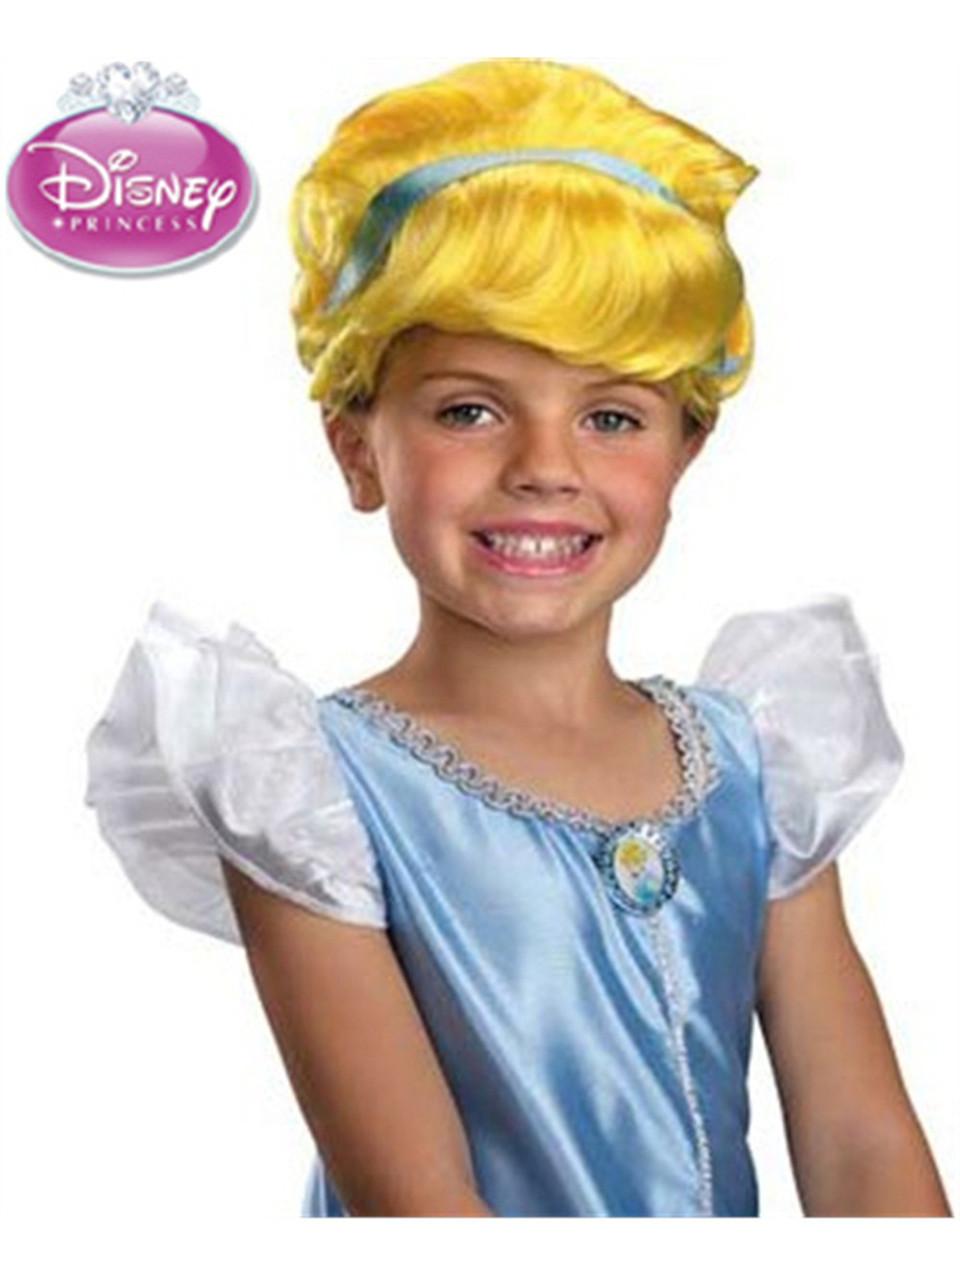 0c812c8f4fe6d9 Disney Princess Cinderella Child's Blonde Costume Dress Up Wig